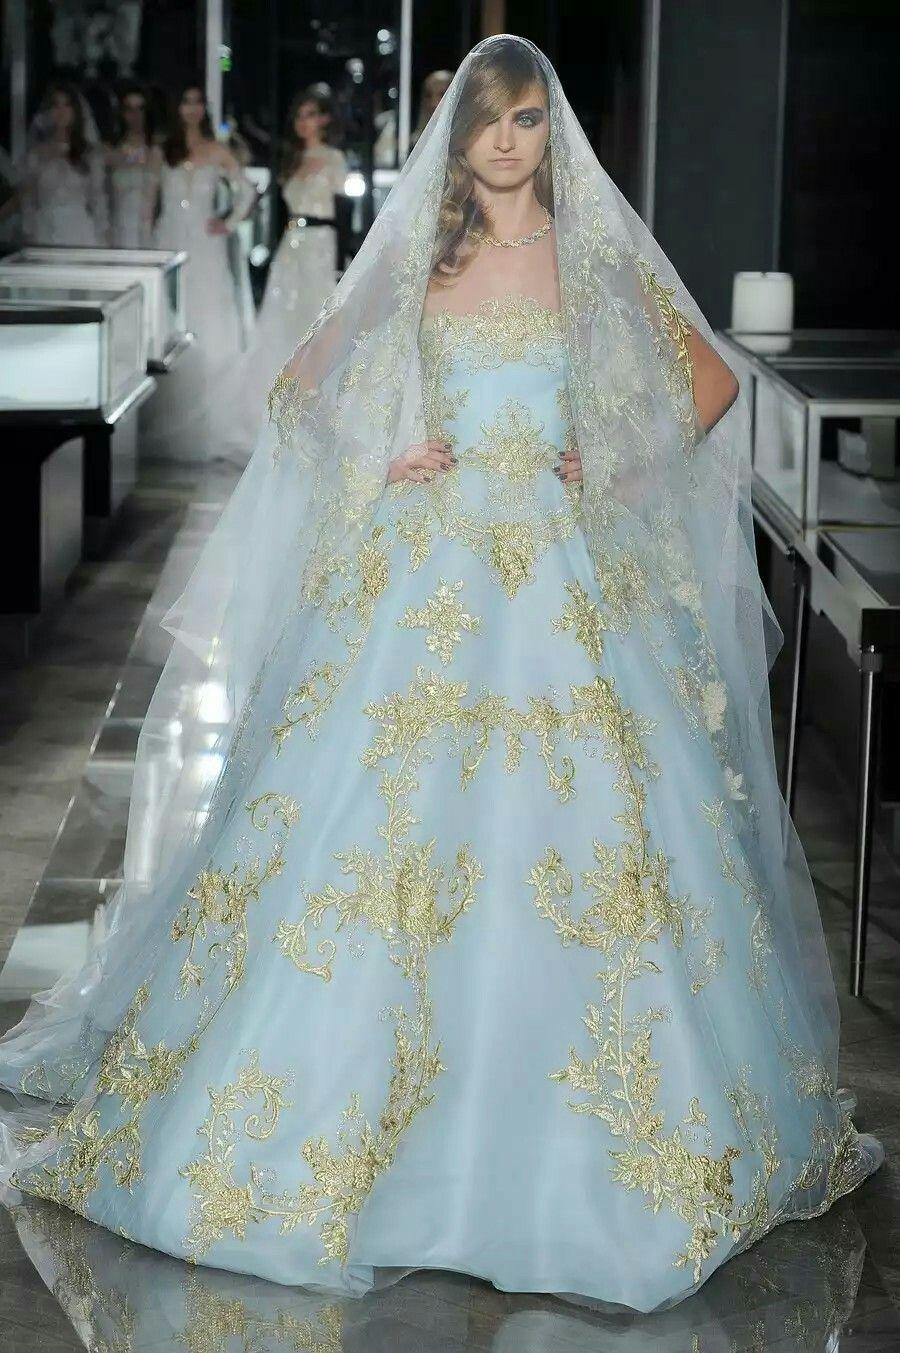 Pin by Phan Vỹ Thy on wedding dreams - LOVING IS WONDERFUL ...